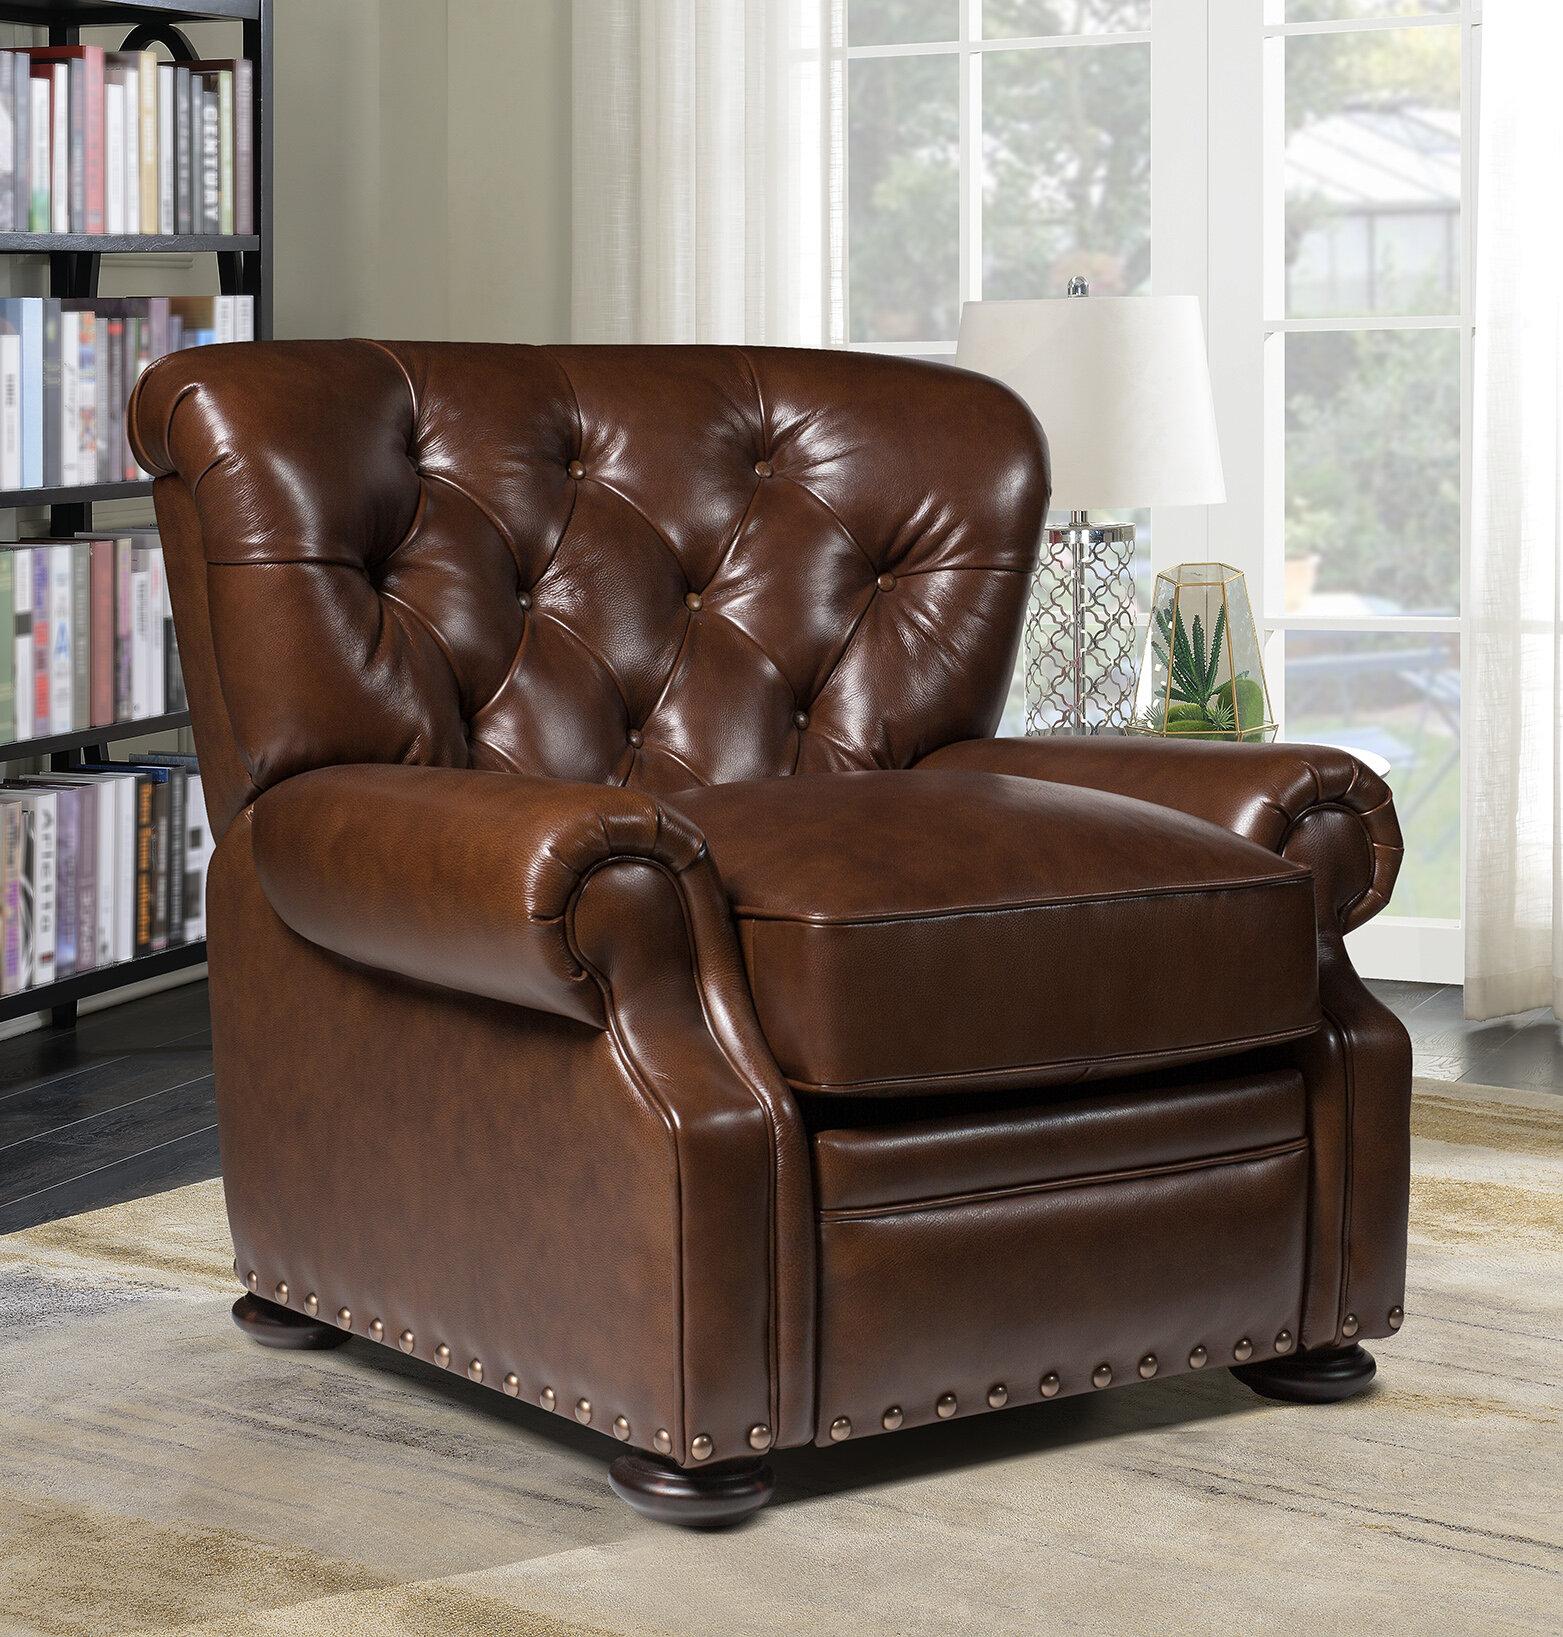 Magnificent Ty Leather Manual Recliner Spiritservingveterans Wood Chair Design Ideas Spiritservingveteransorg